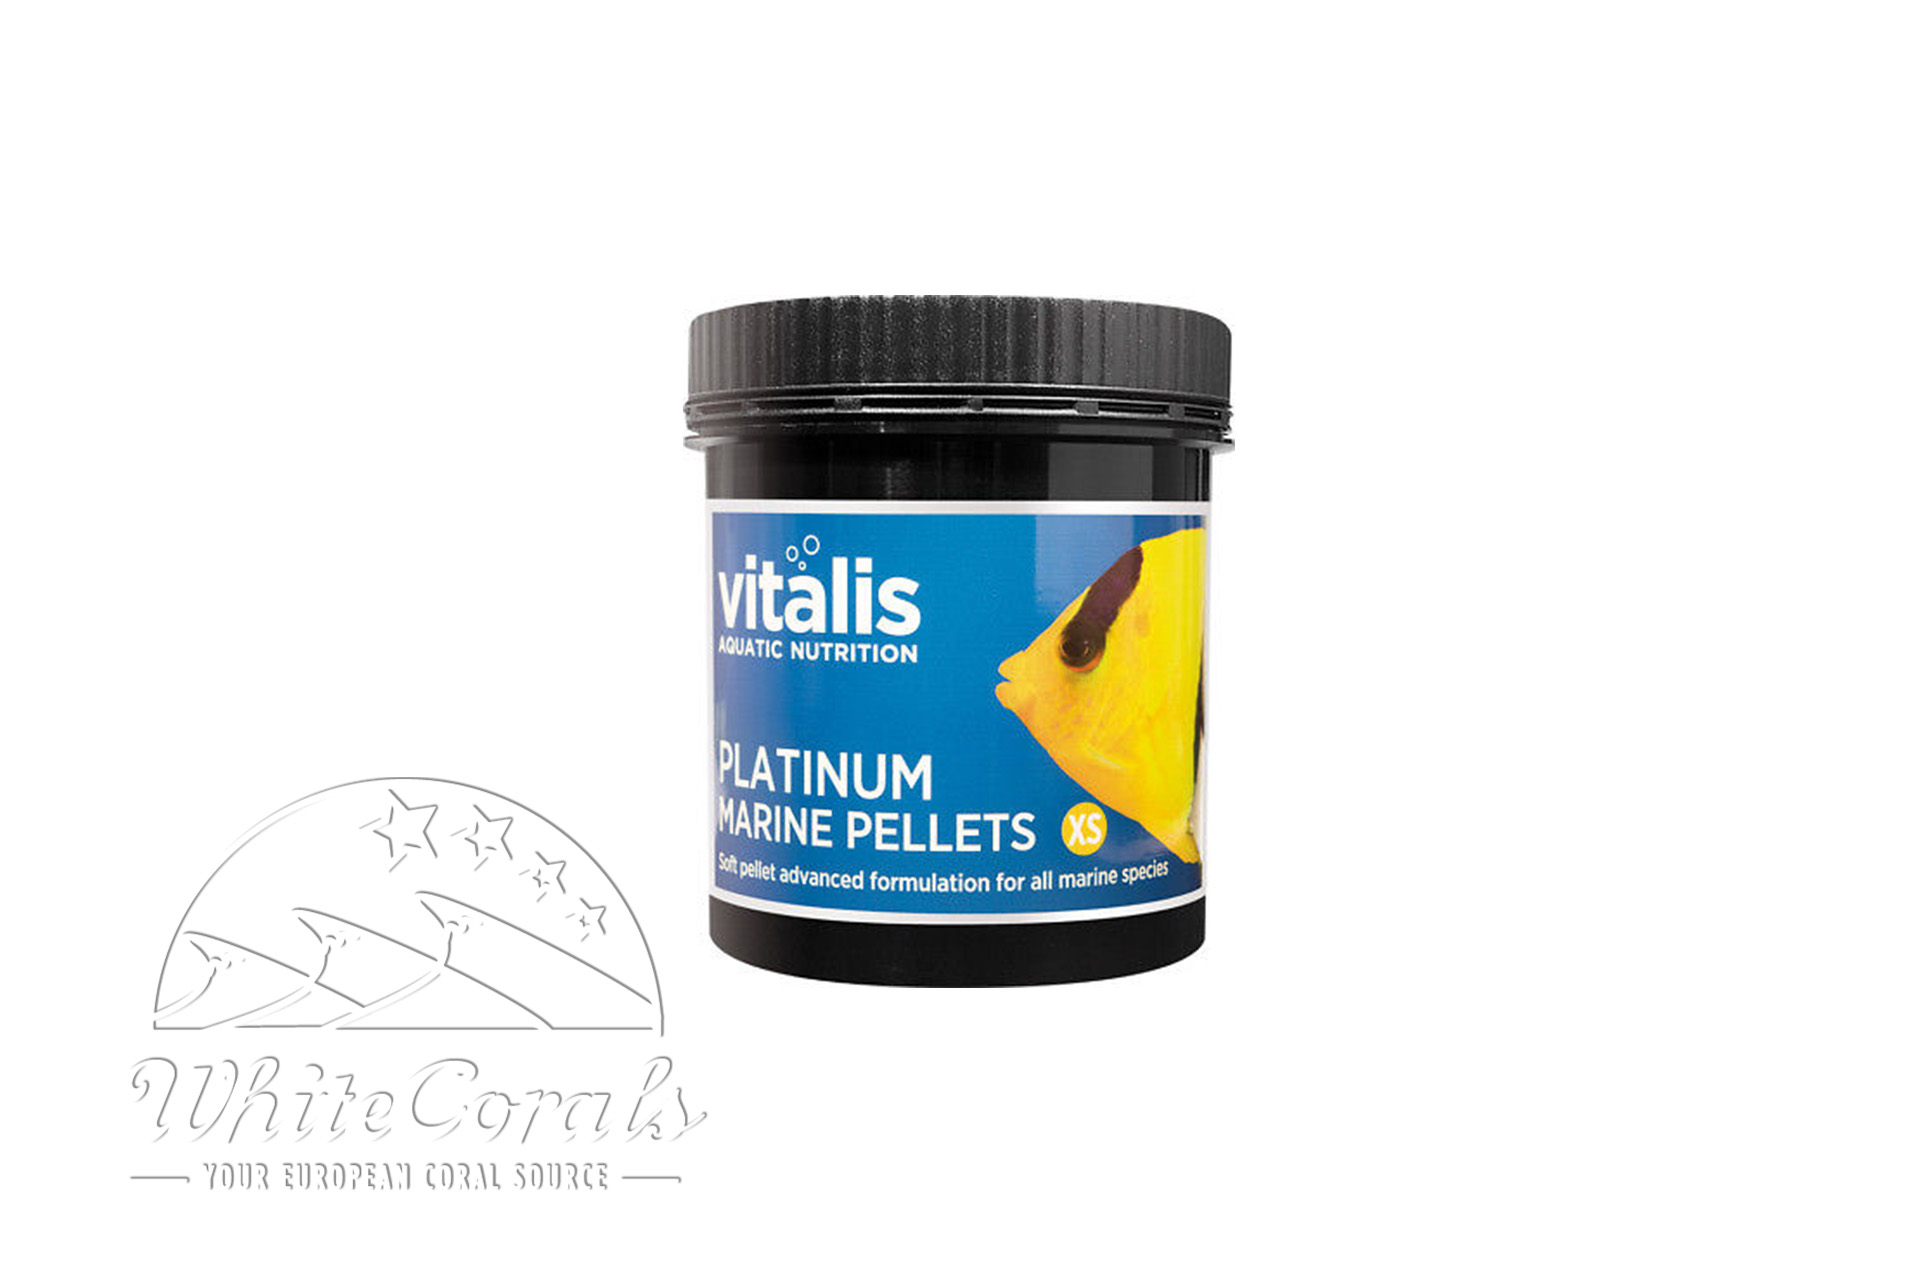 New Era/Vitalis Platinum Marine Pellets XS/1mm 60g fish food